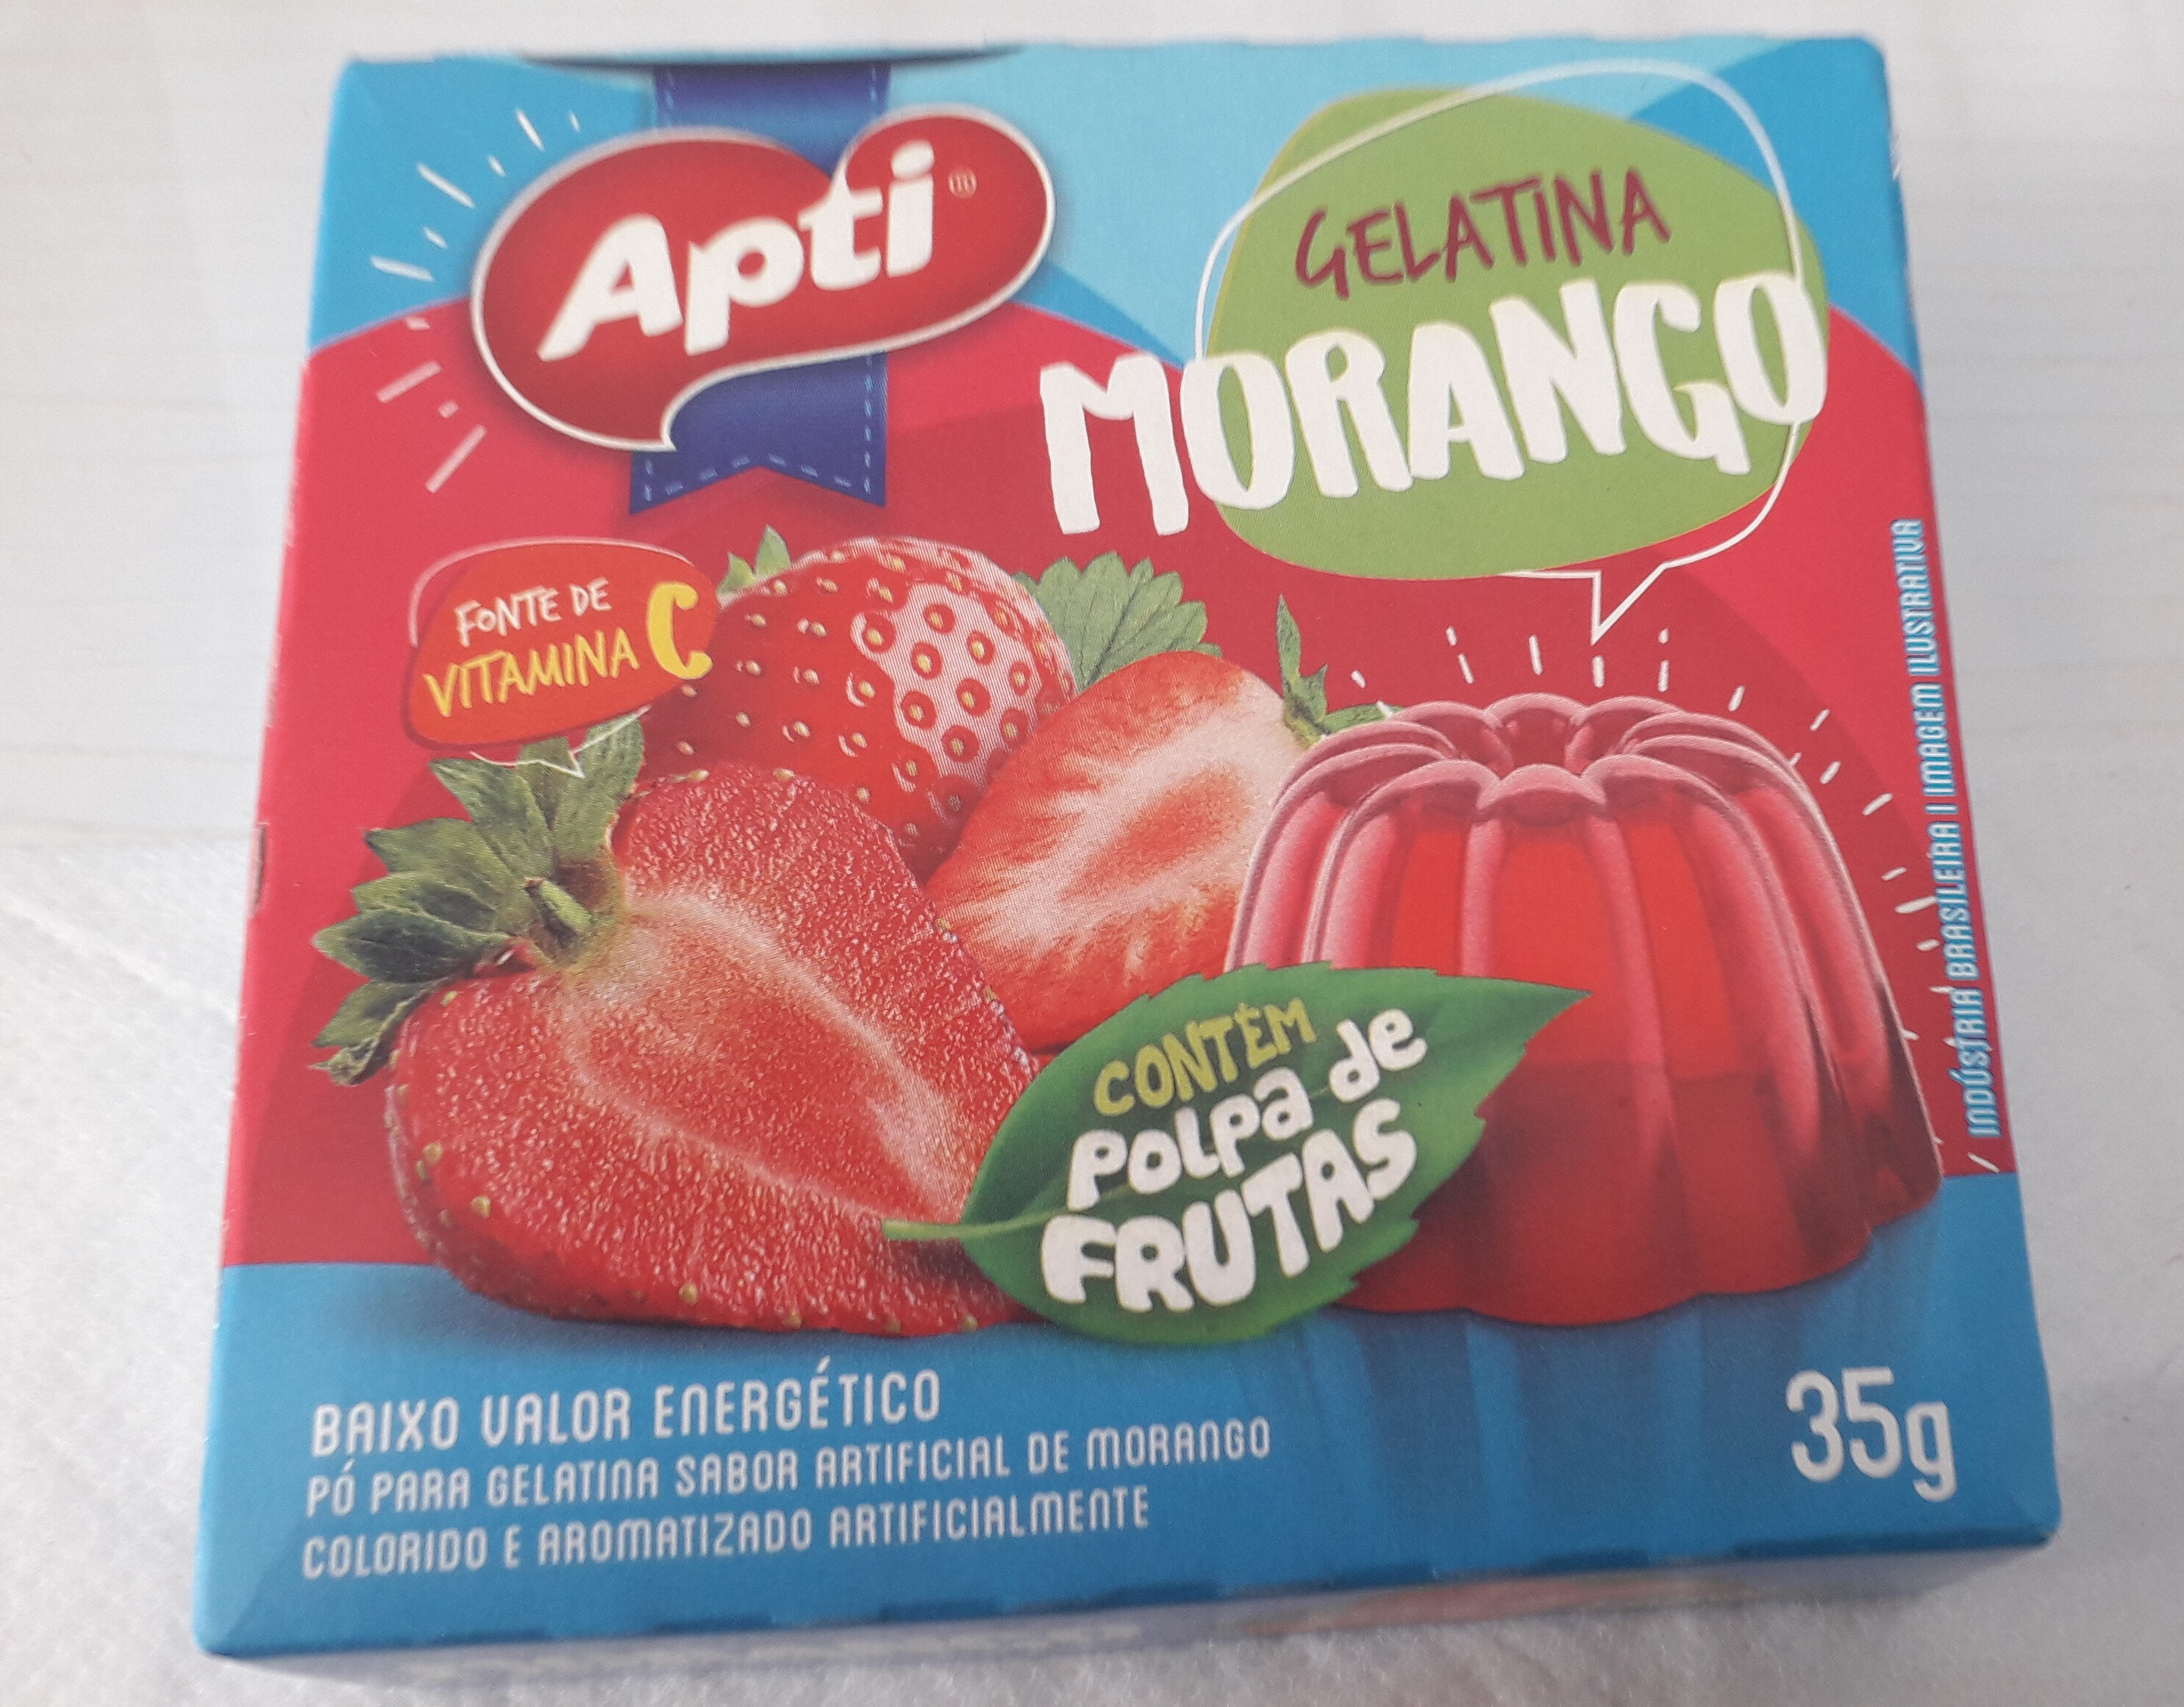 Gelatina de Morango - Product - pt